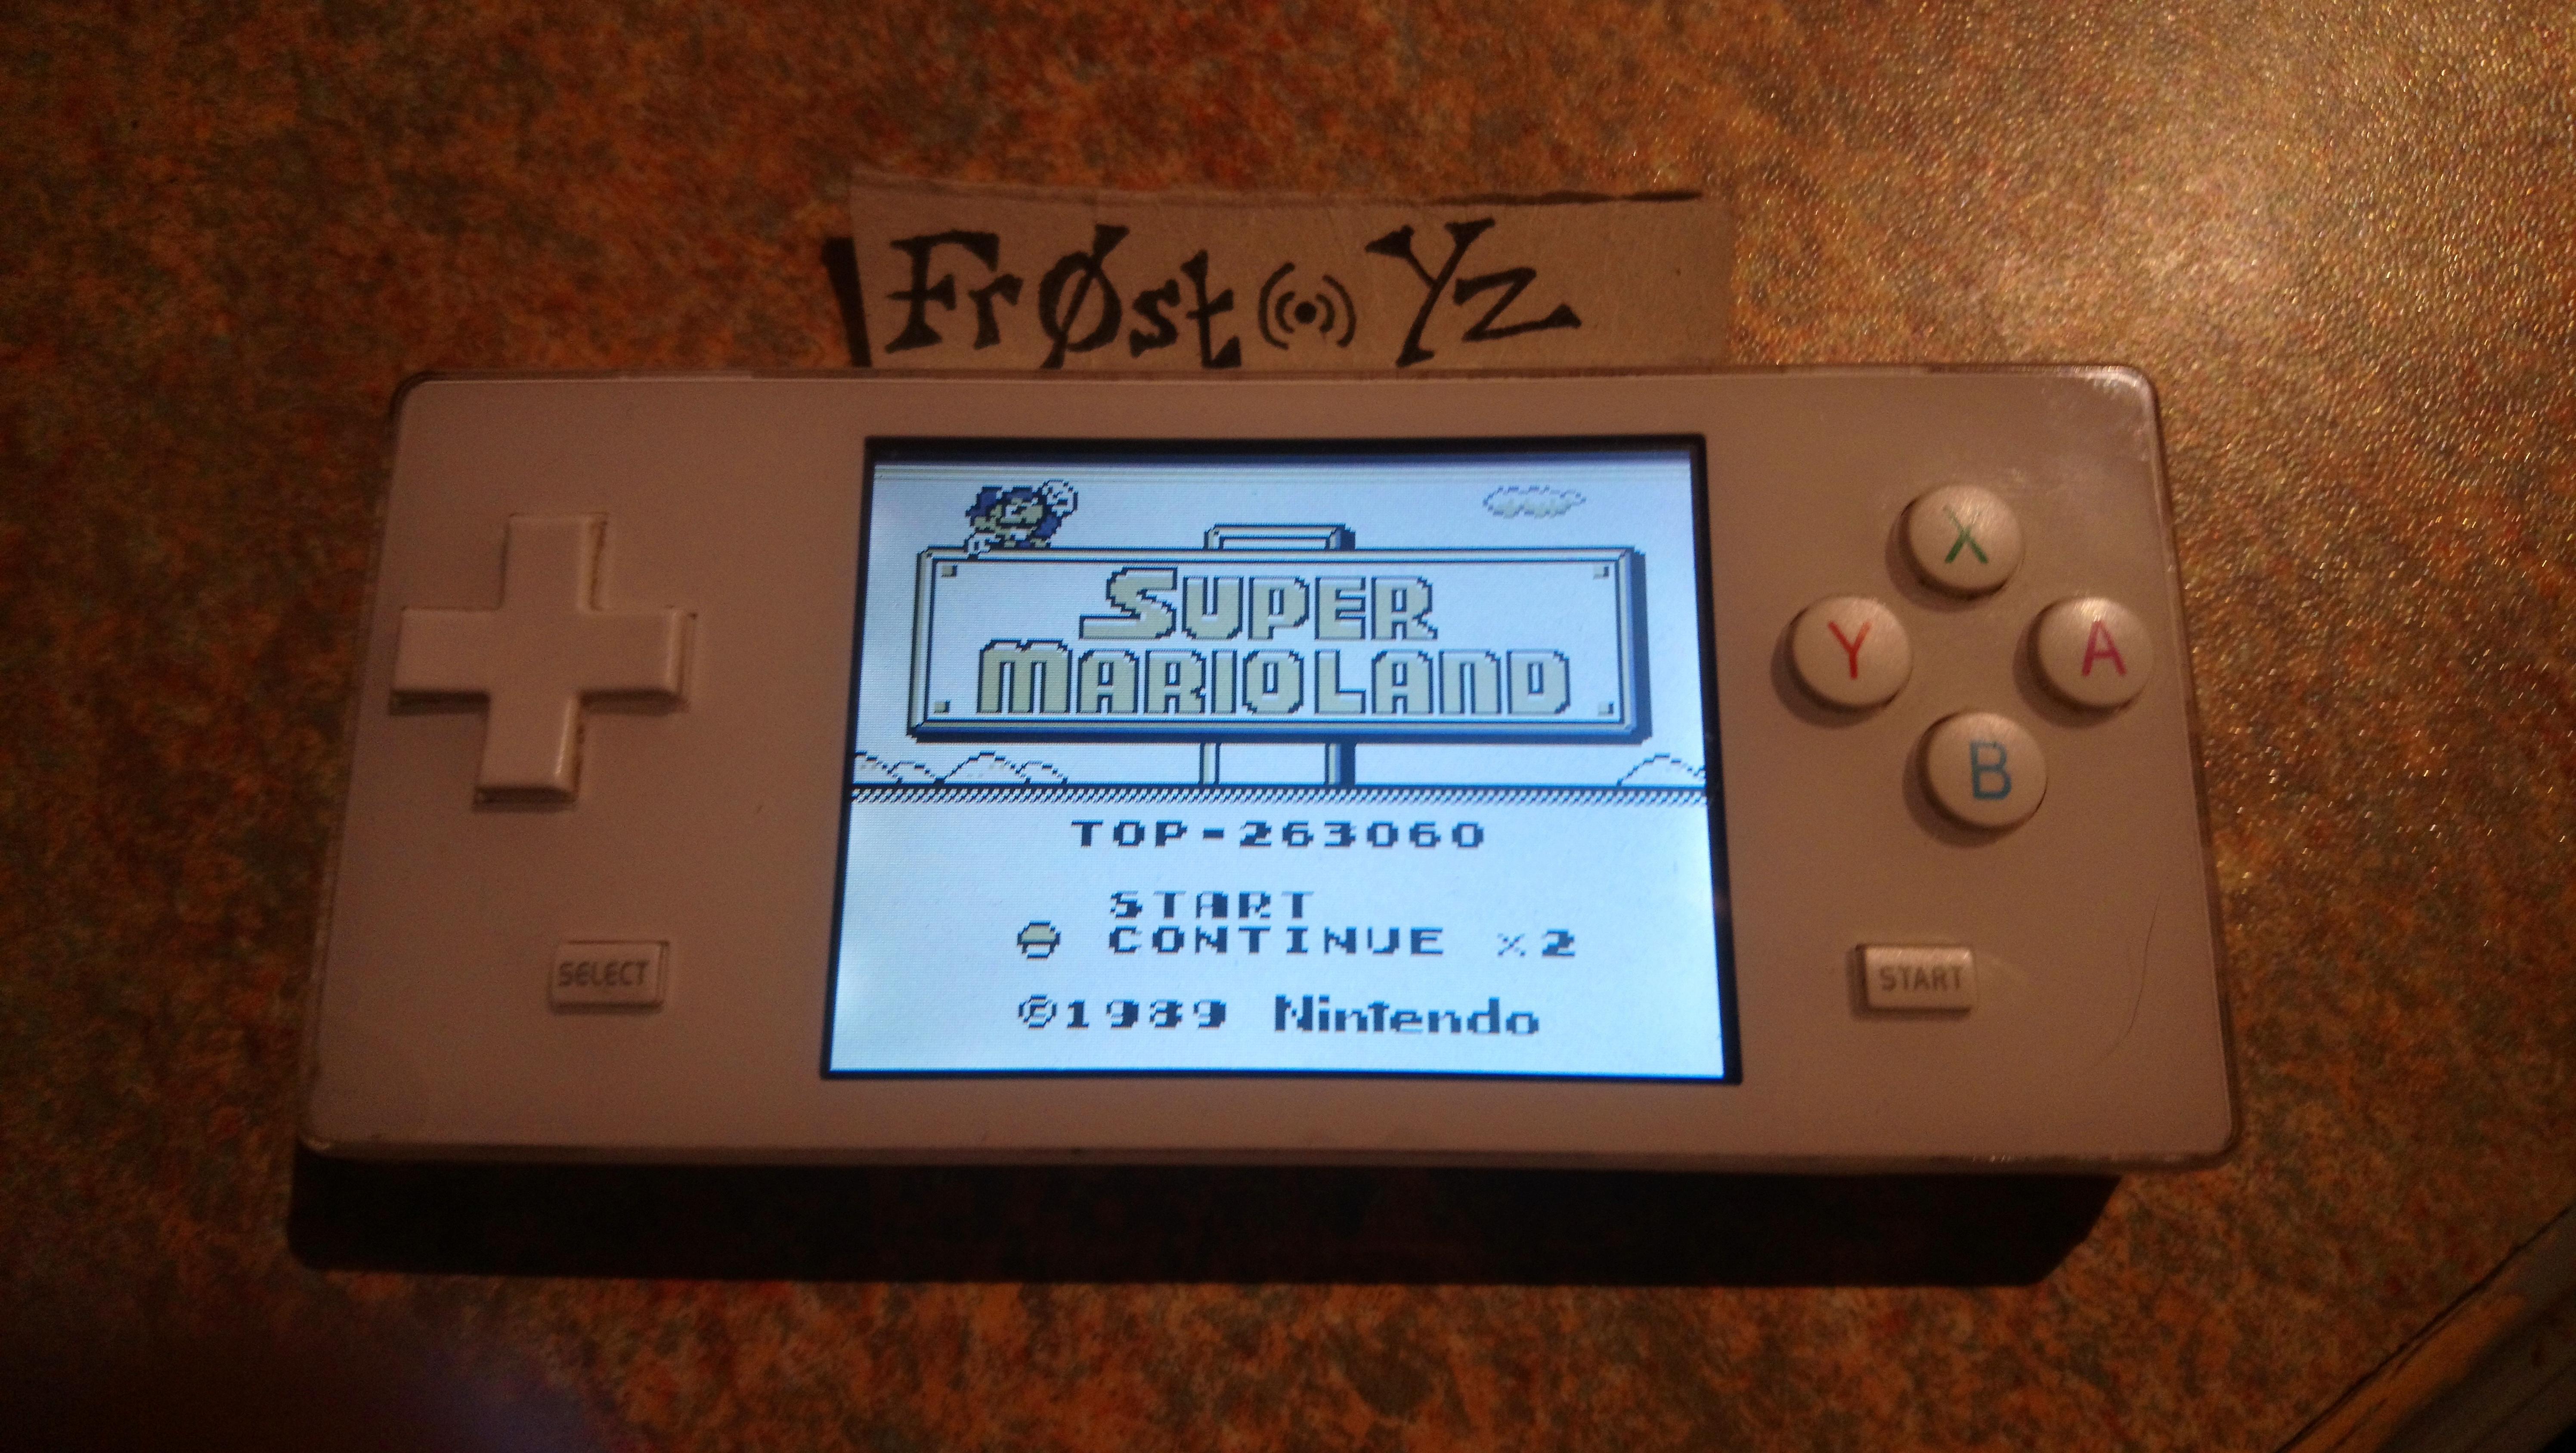 Fr0st: Super Mario Land (Game Boy Emulated) 263,060 points on 2019-01-19 15:53:05